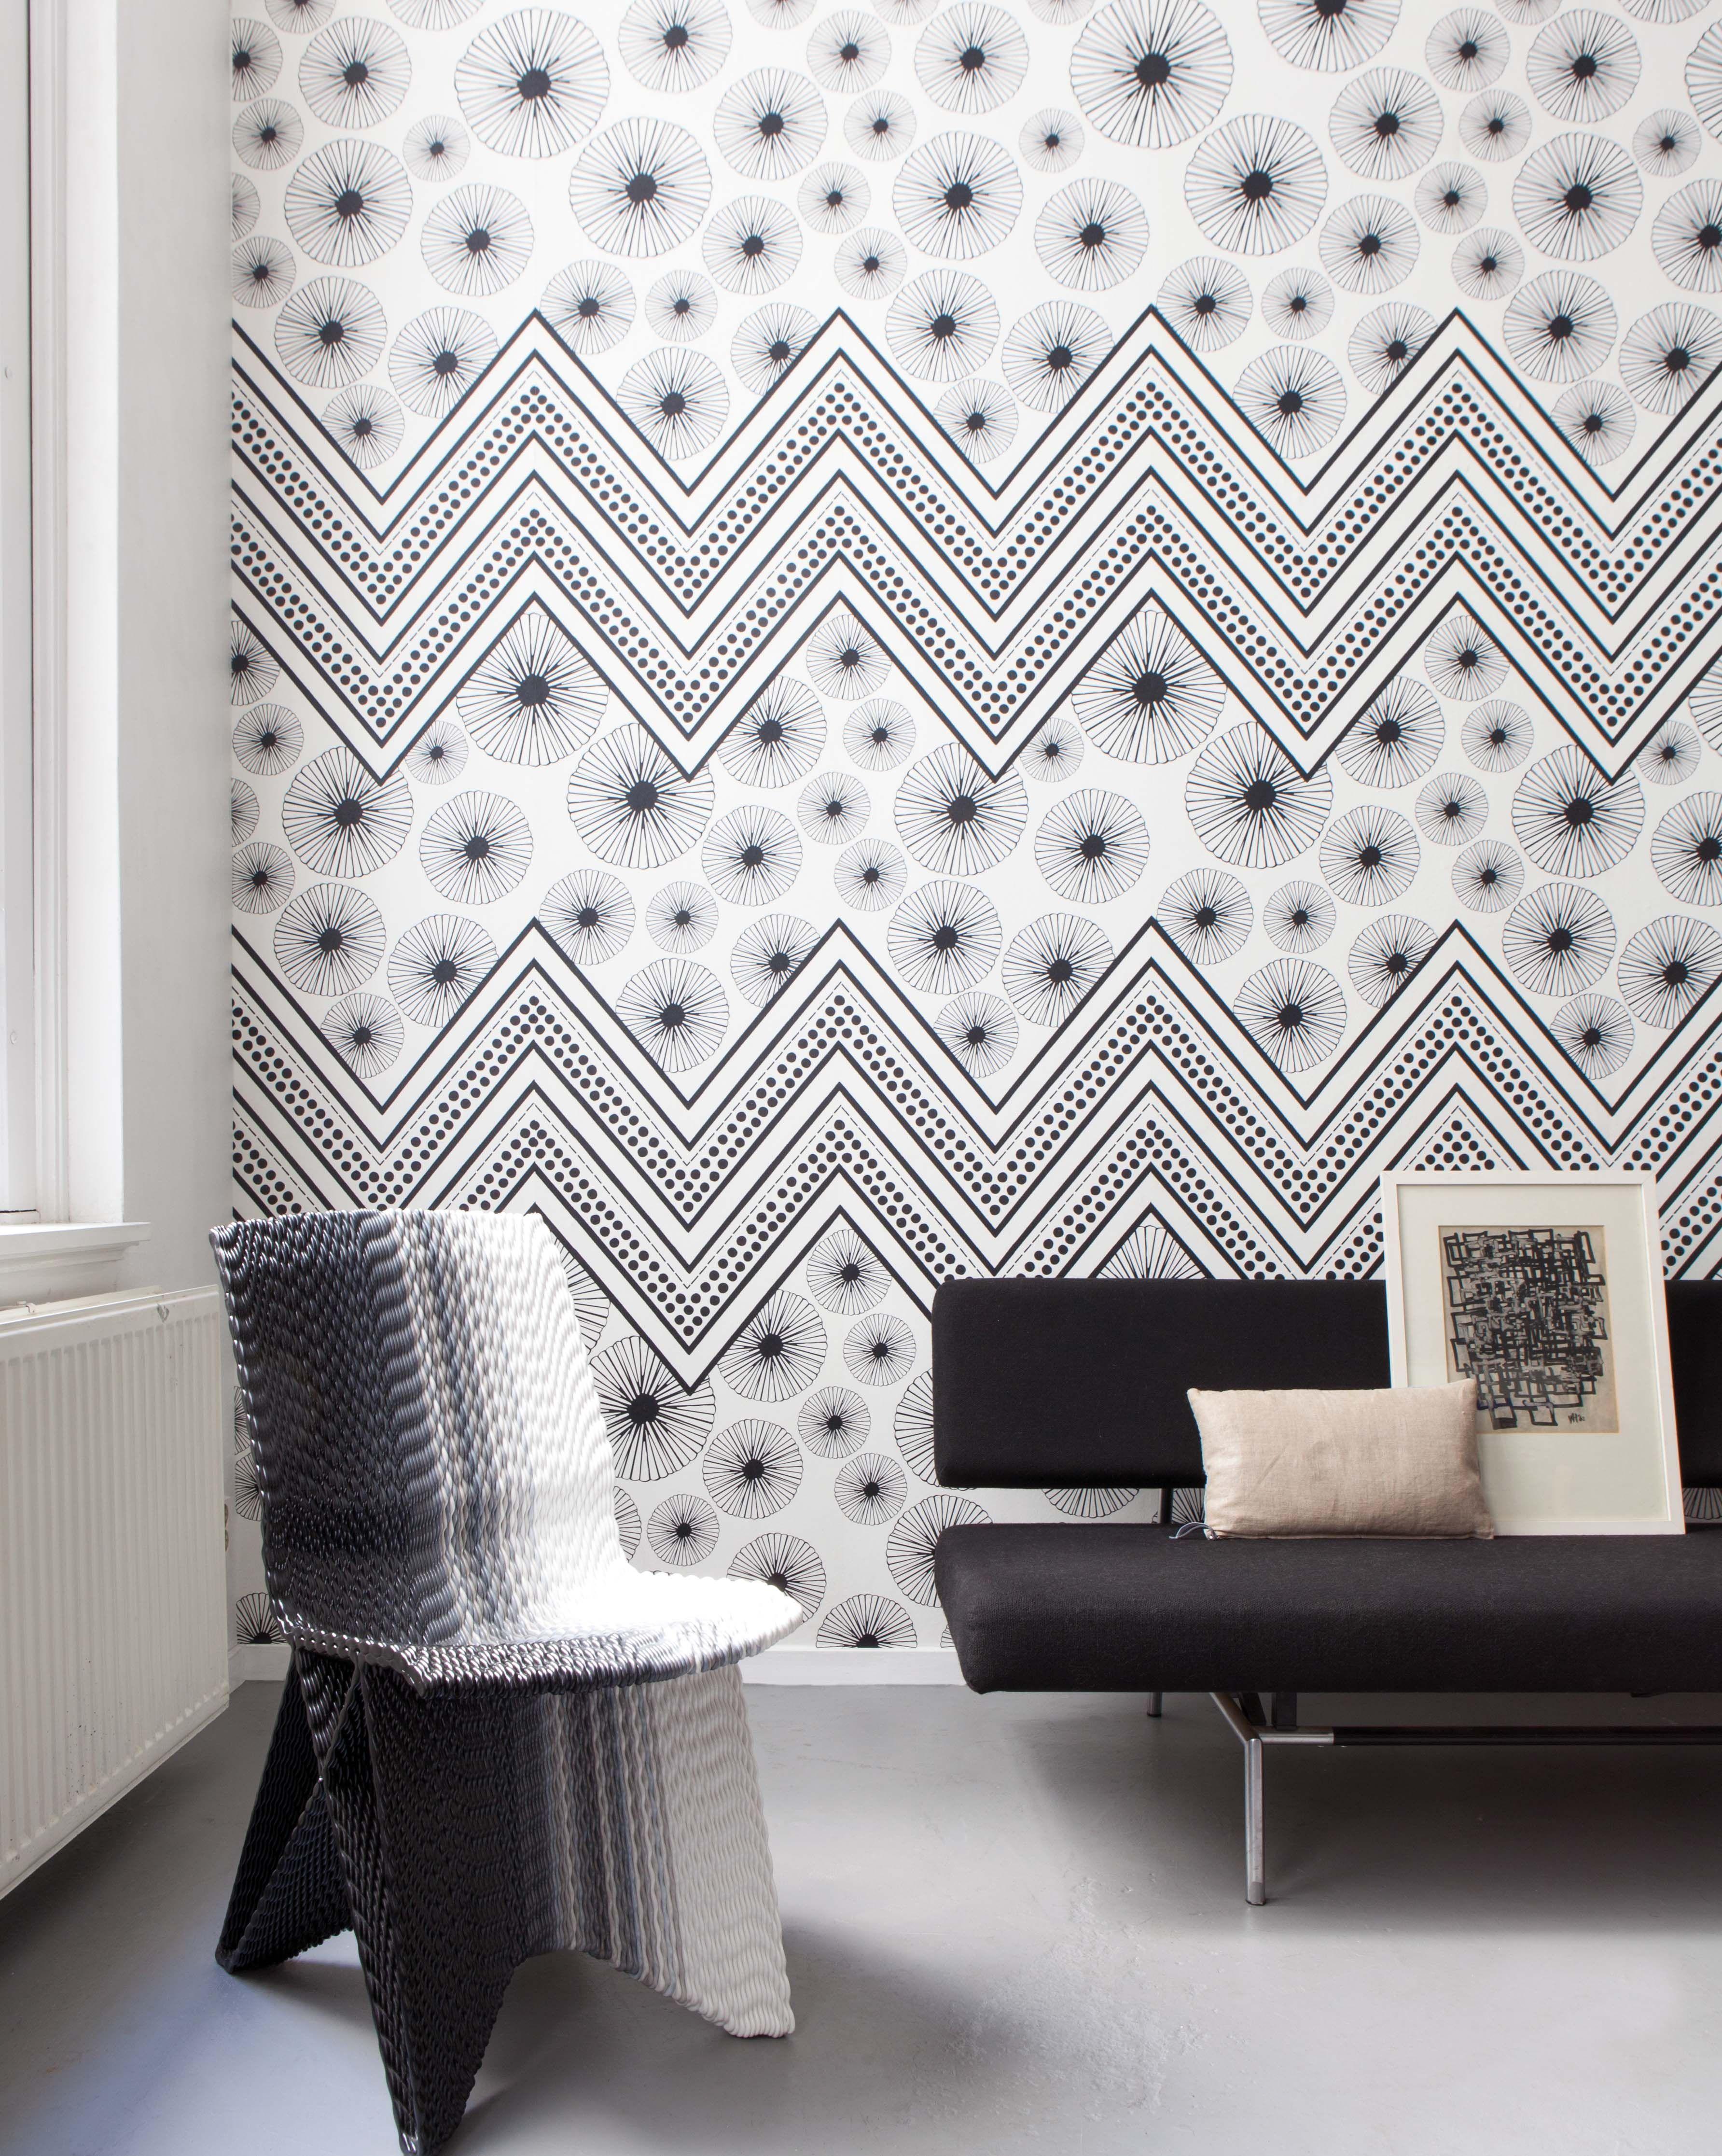 532043 Studio Onszelf Contemporary Wallpaper Designs Stun